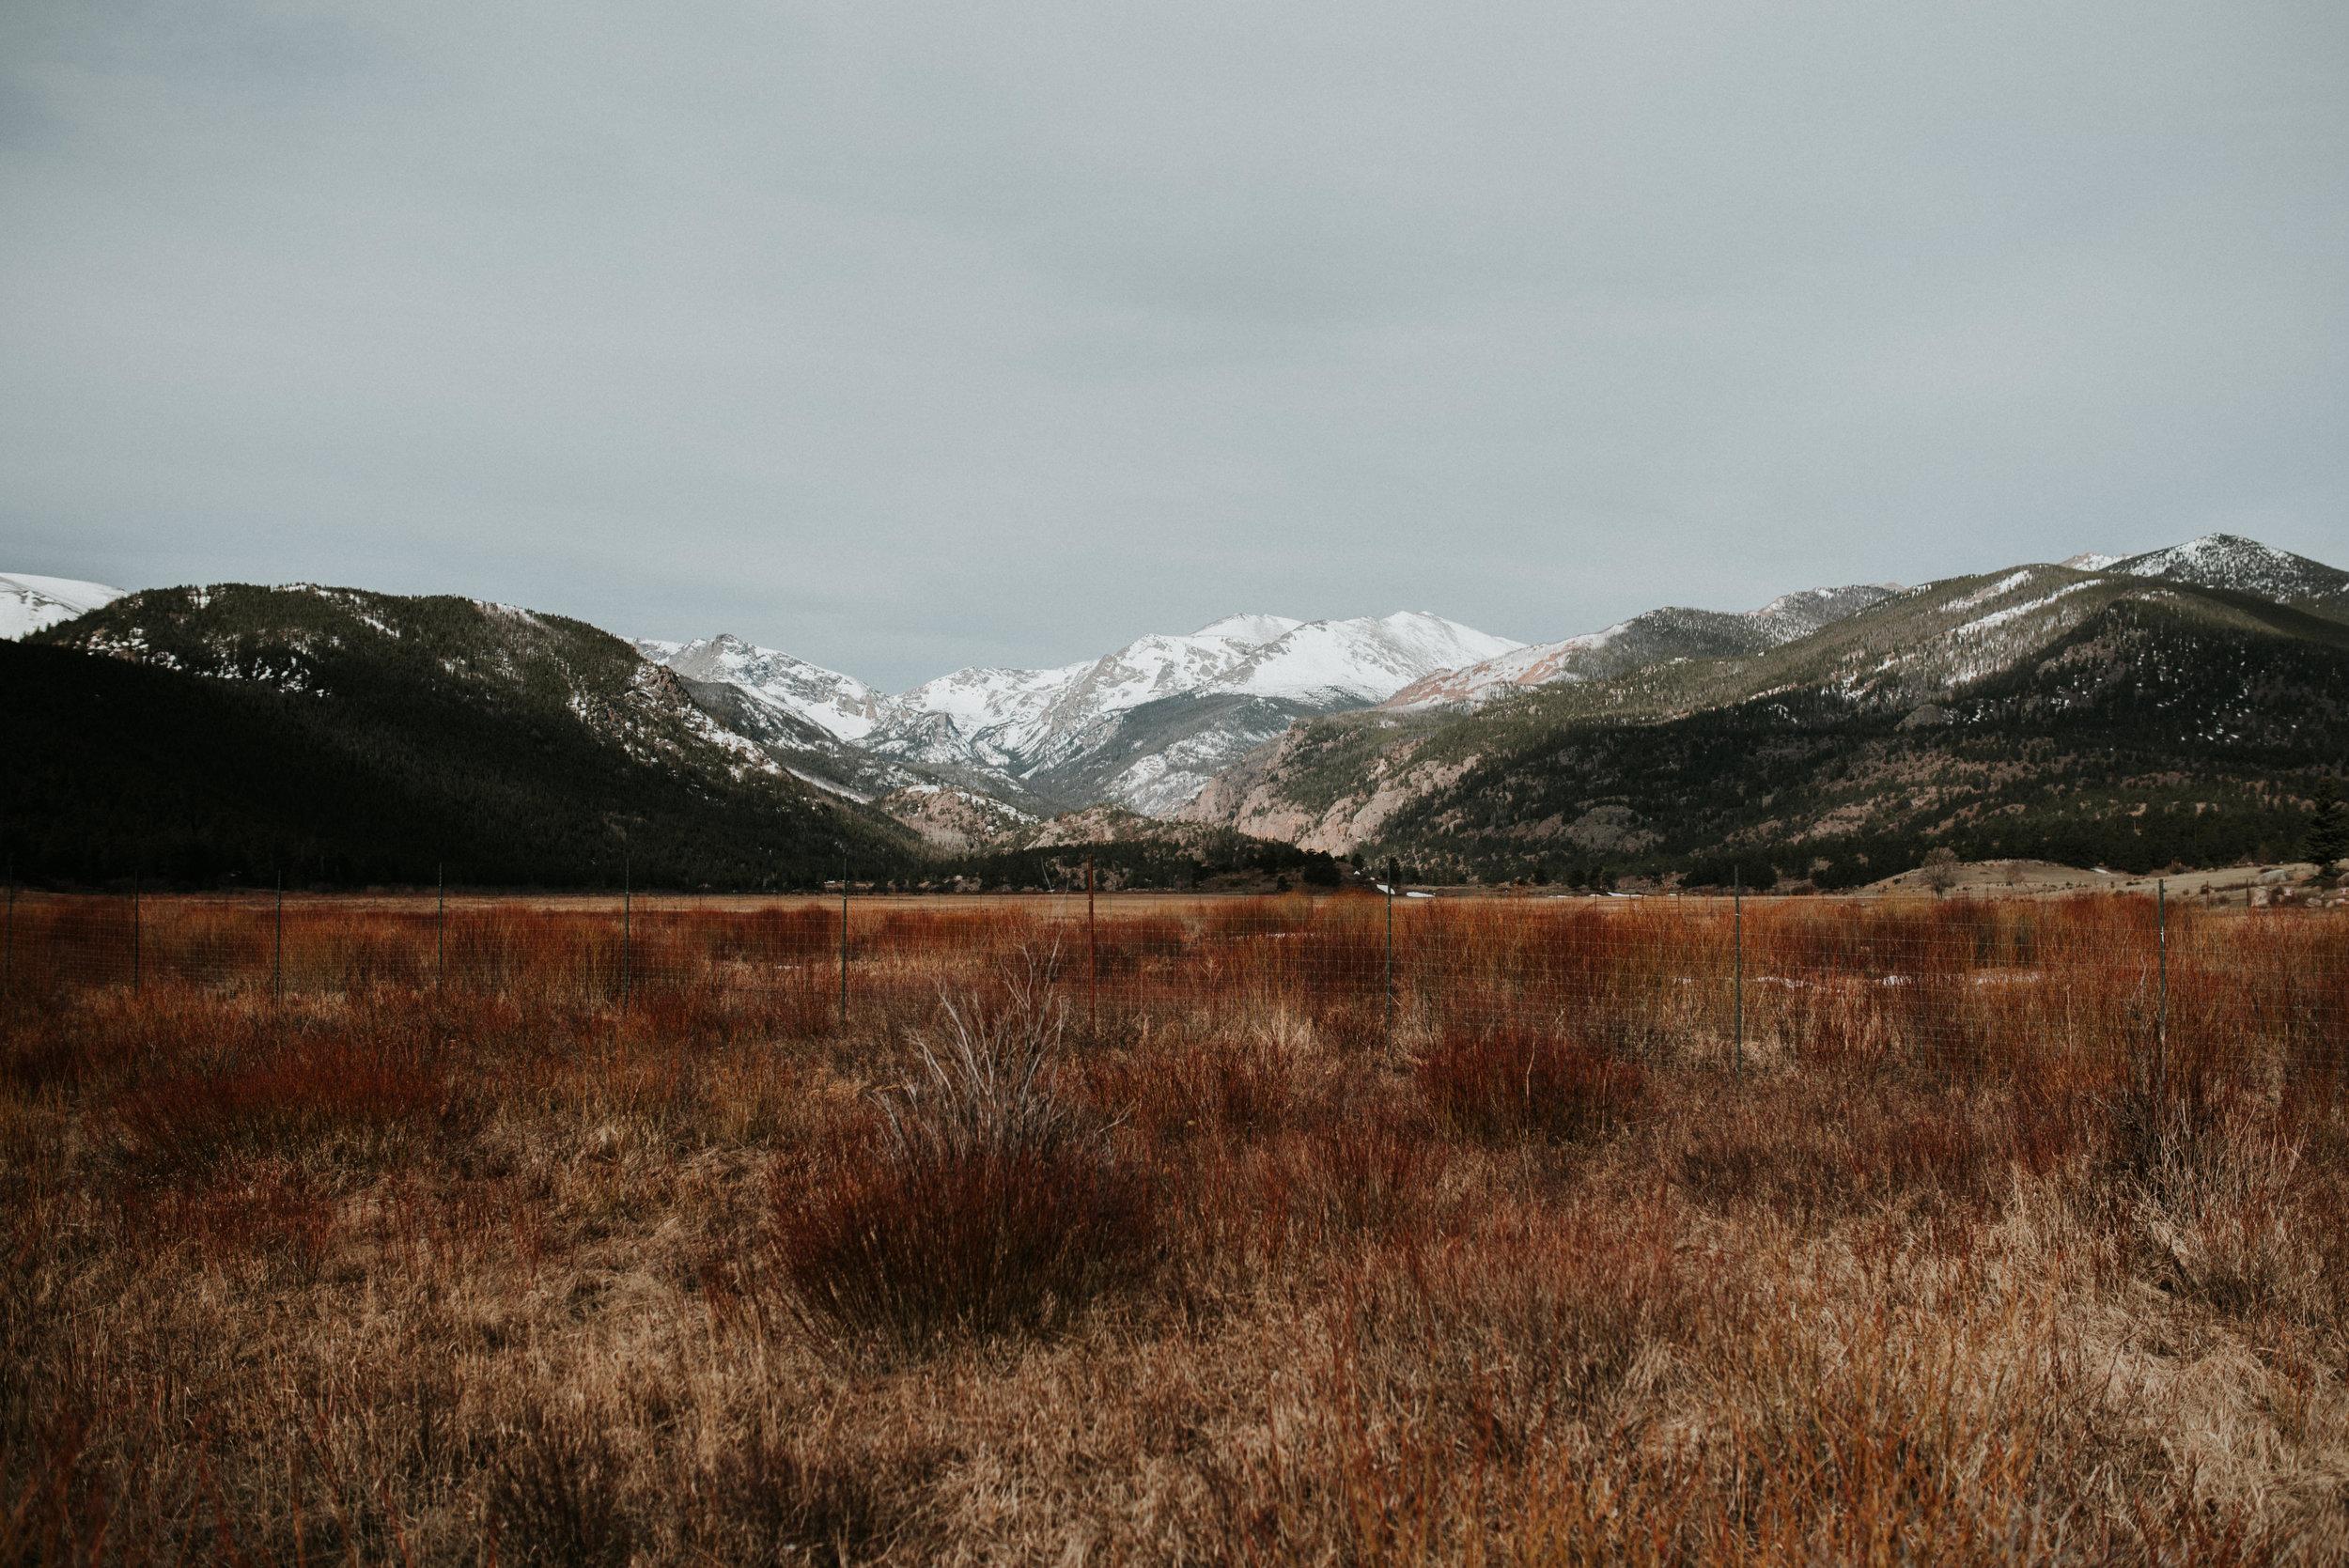 Zach&Rosalie Rocky Mountain National Park Engagement Denver Colorado Rocky Mountain Wedding Photographer00005.jpg